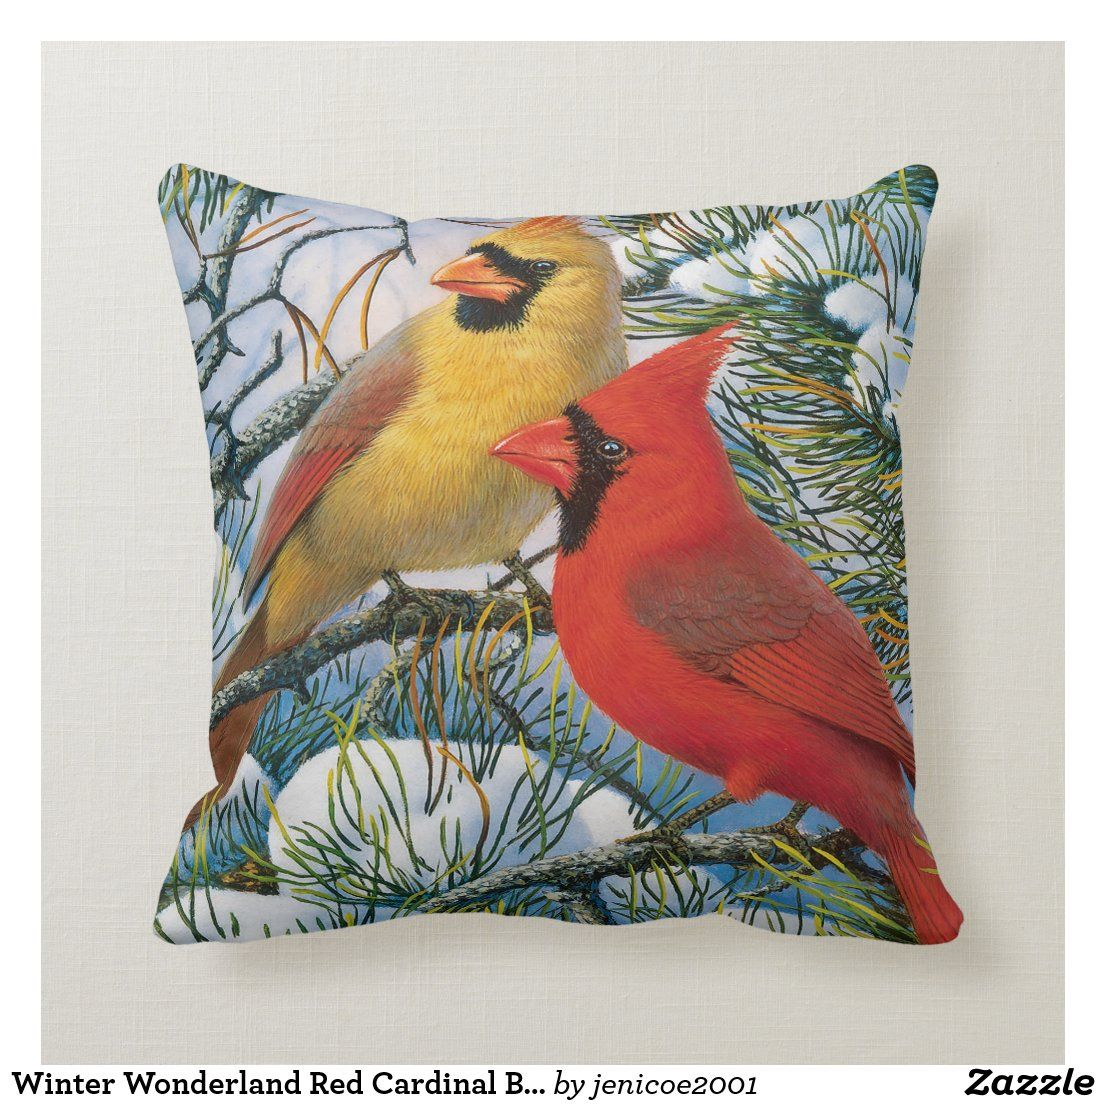 Winter Wonderland Red Cardinal Birds Christmas Throw Pillow Zazzle Com Throw Pillows Christmas Christmas Throws Throw Pillows